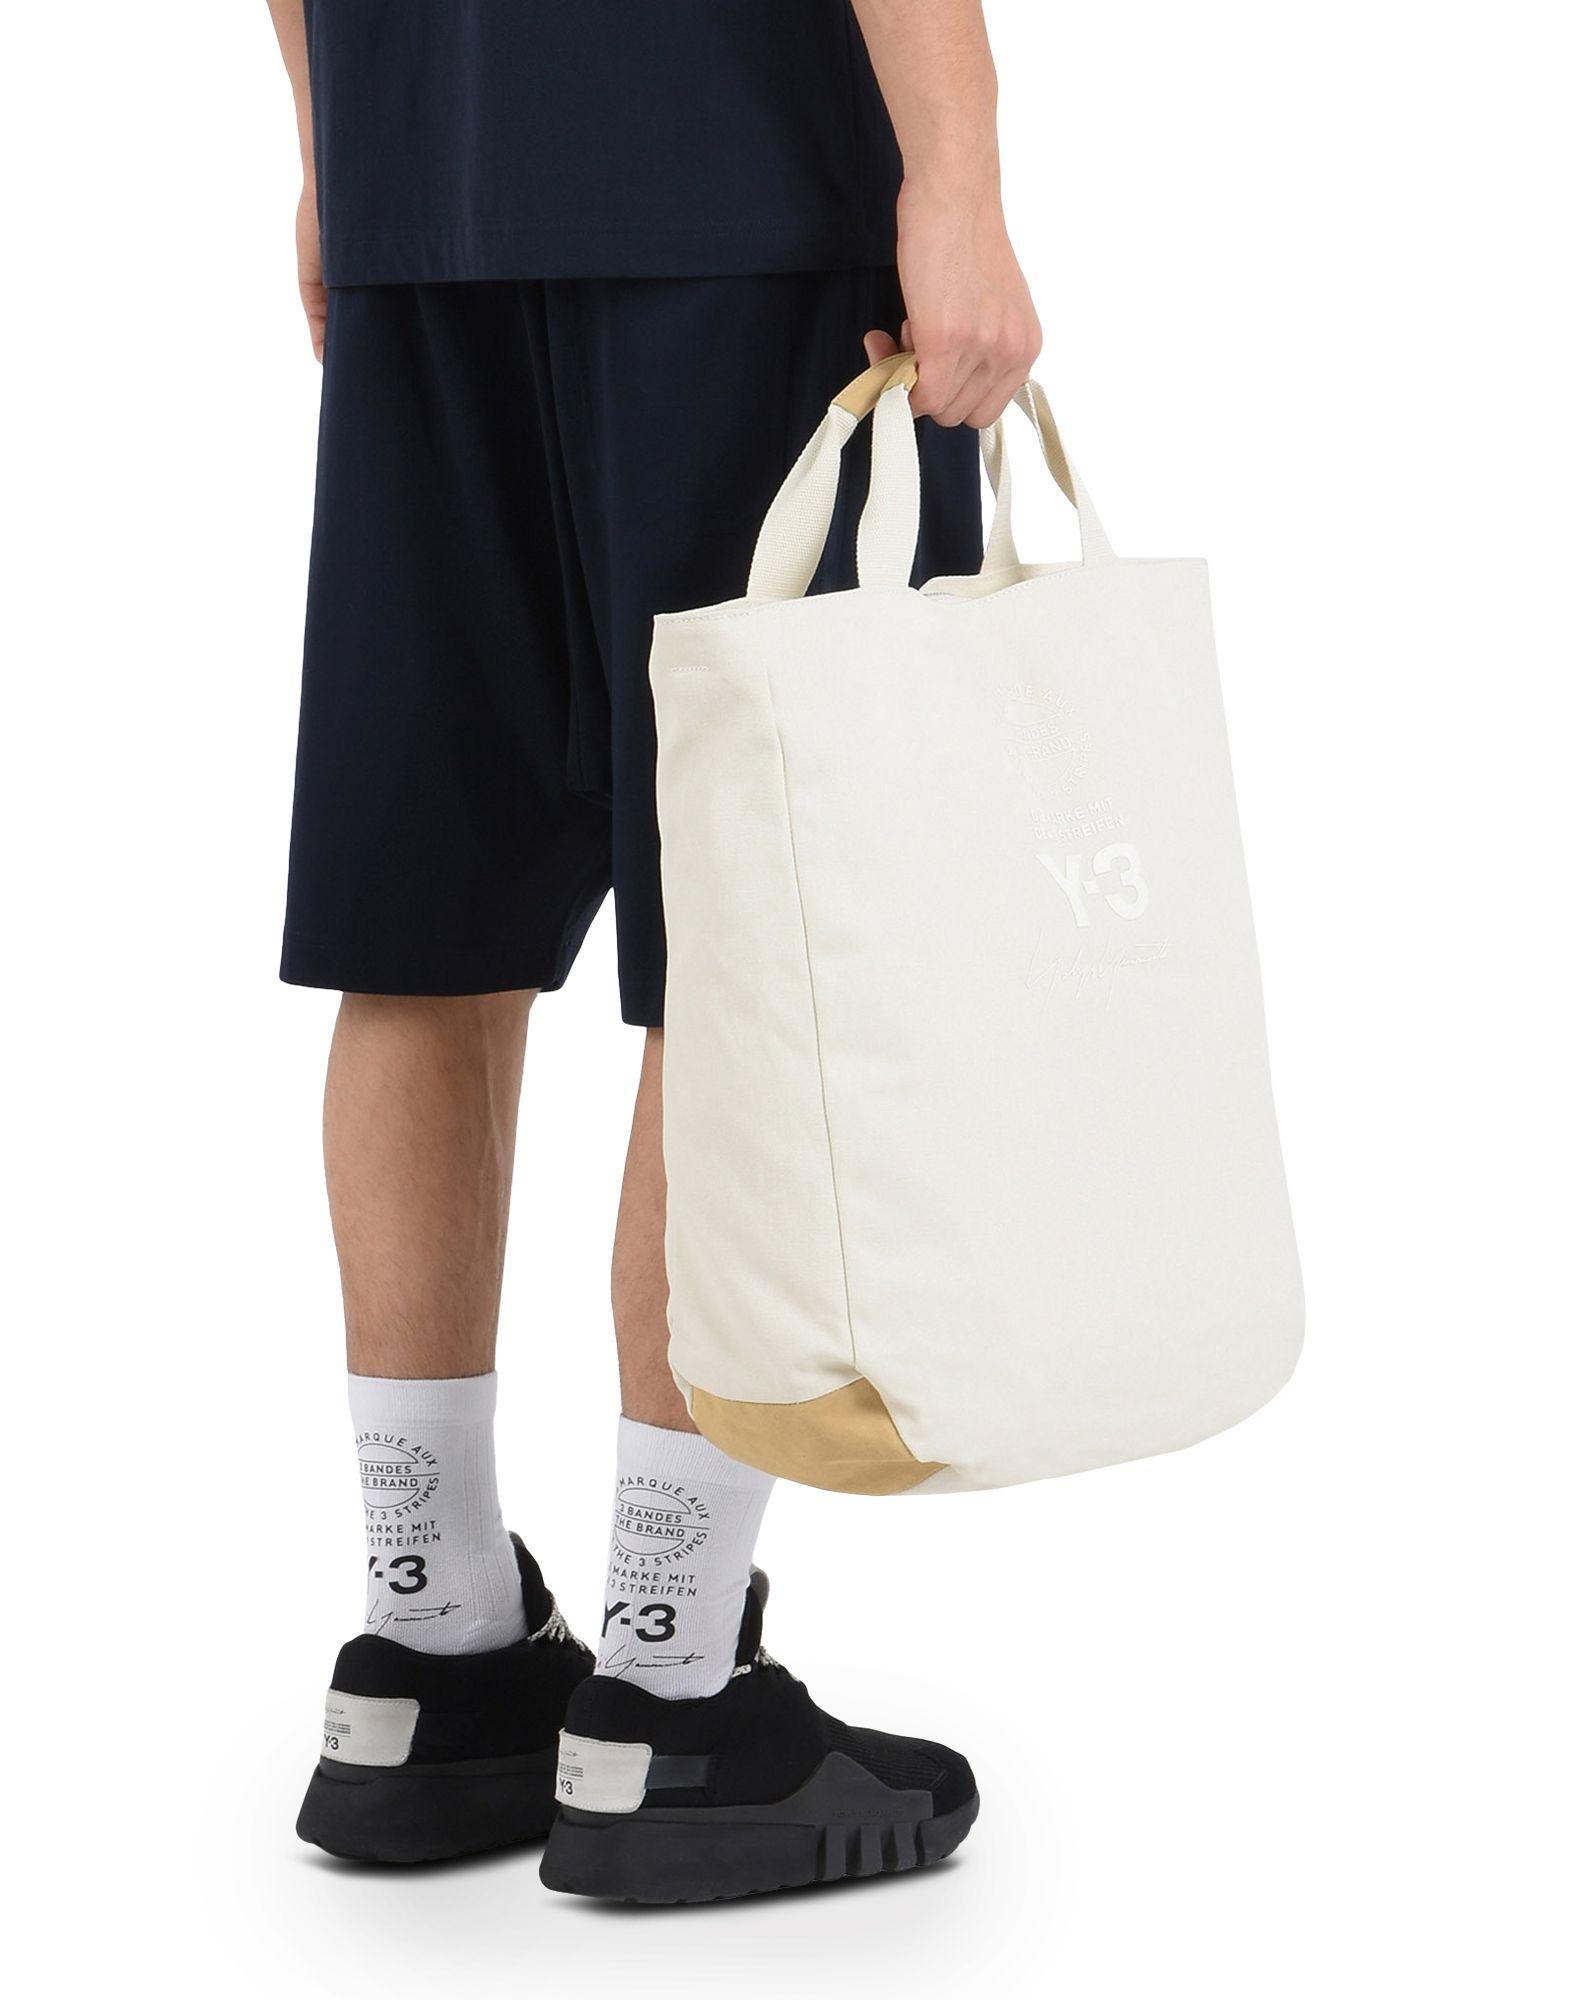 Y-3 Y-3 TOTE BAG Средняя сумка из текстиля E r